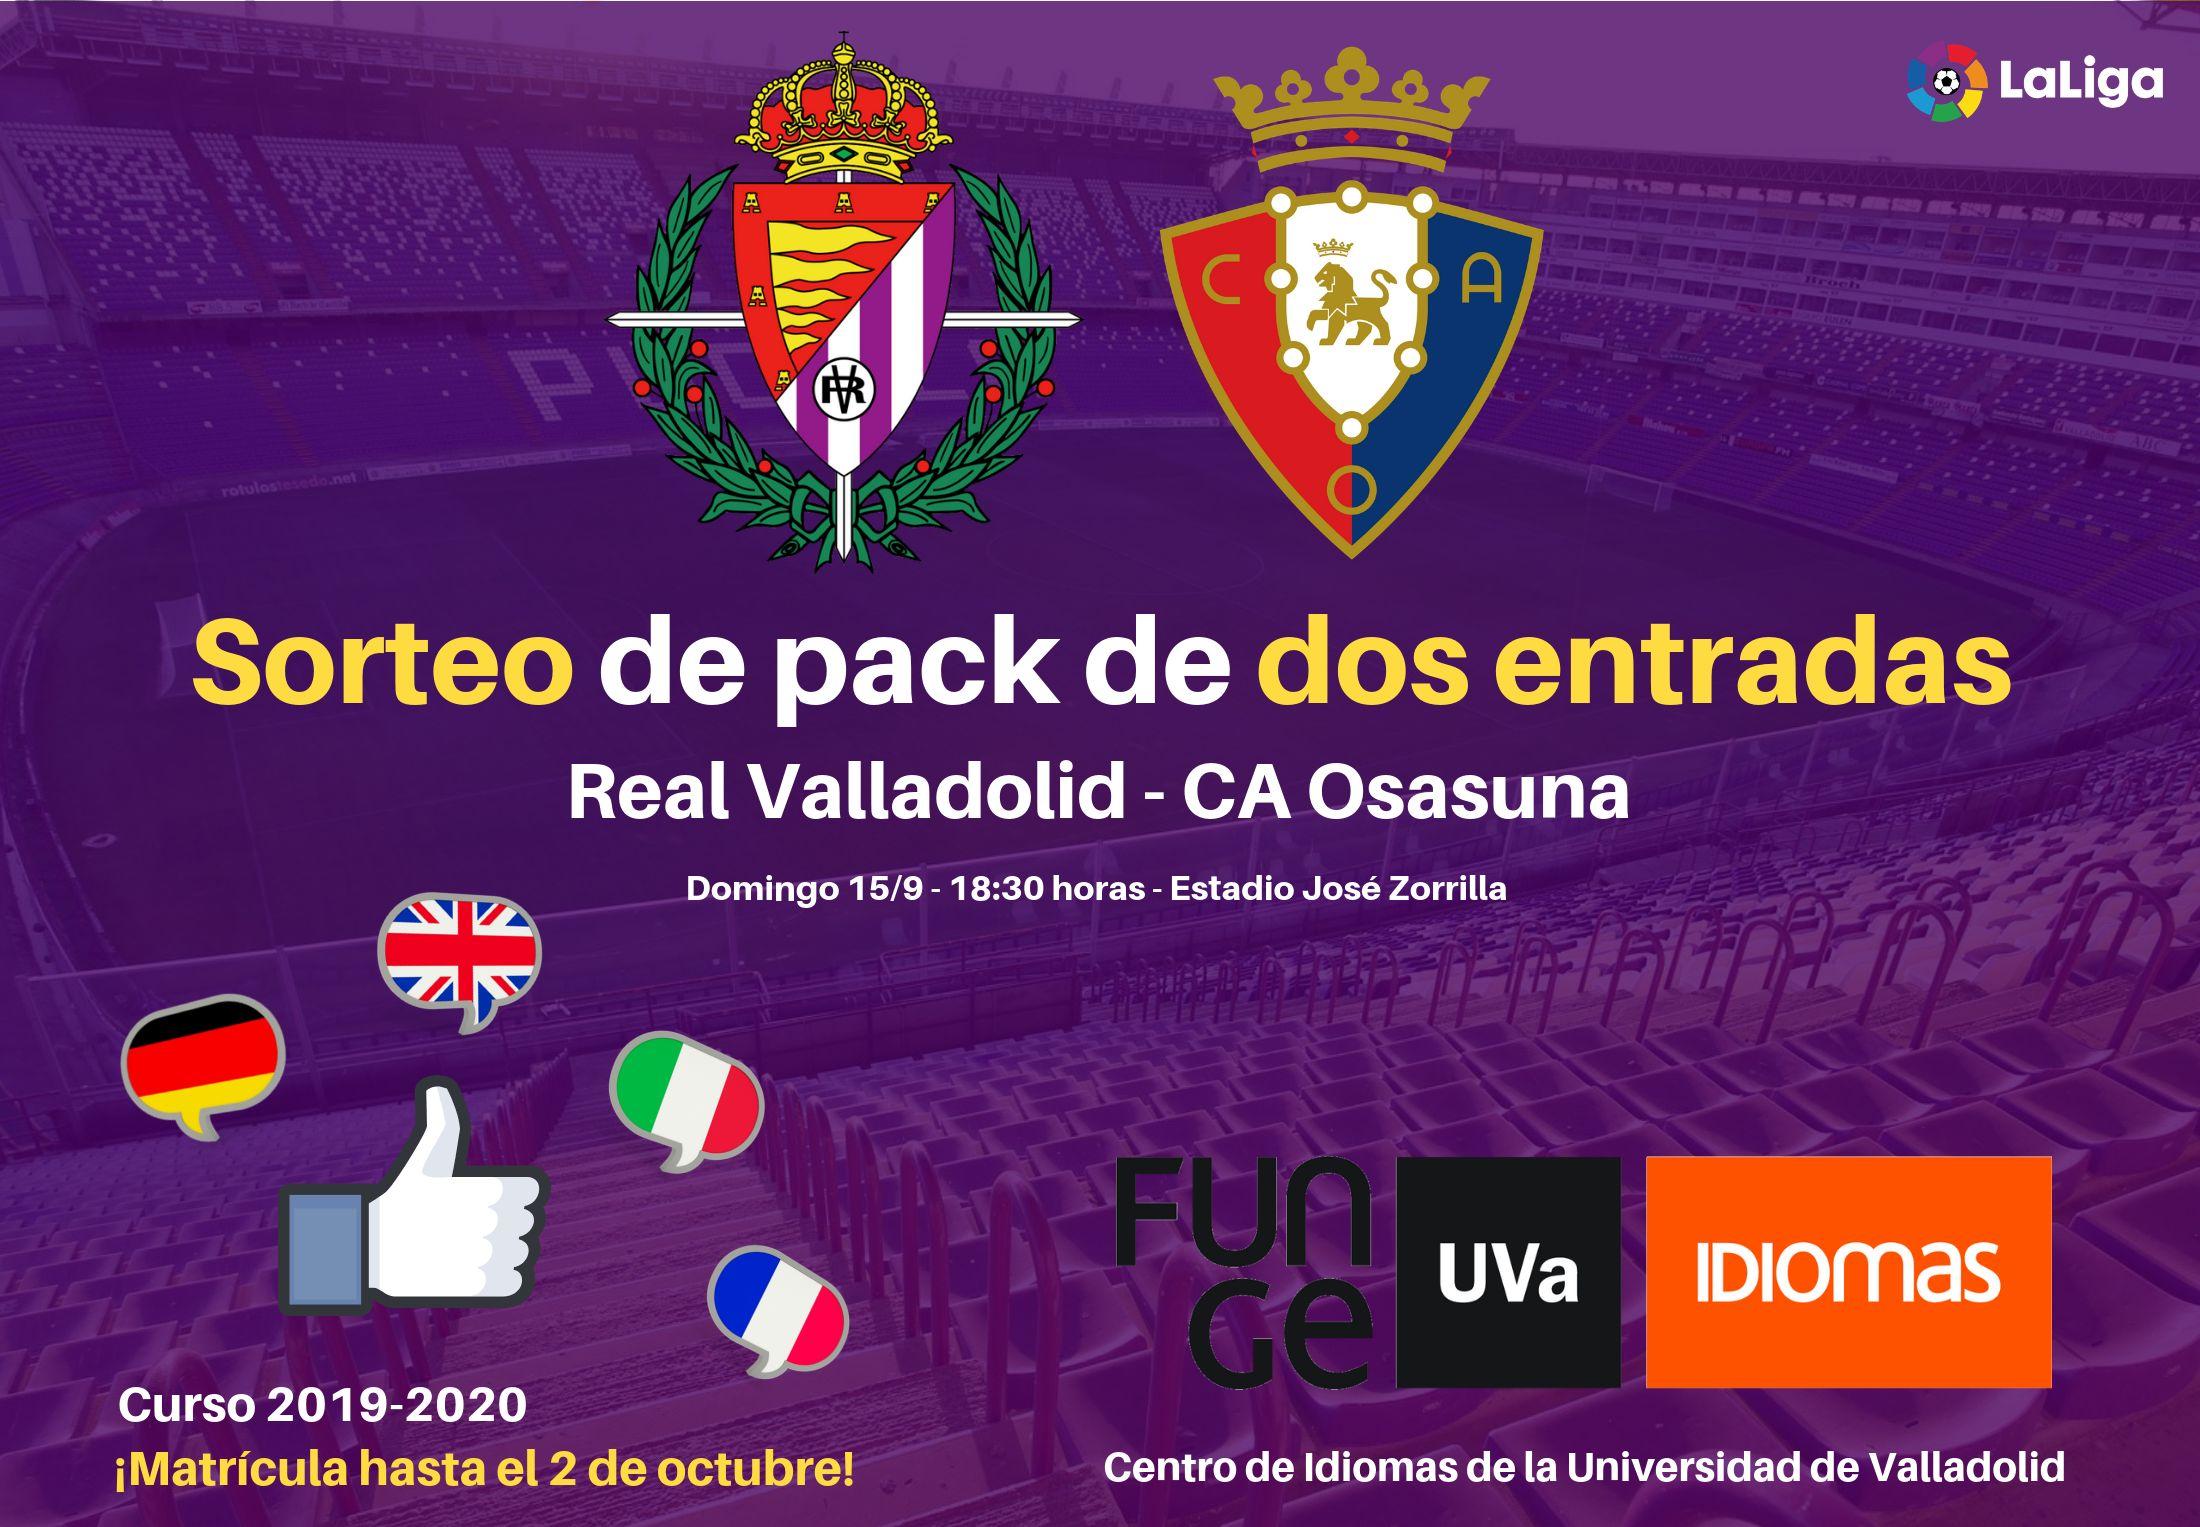 Sorteo de dos entradas Real Valladolid - Osasuna - Centro de Idiomas UVa - 2019